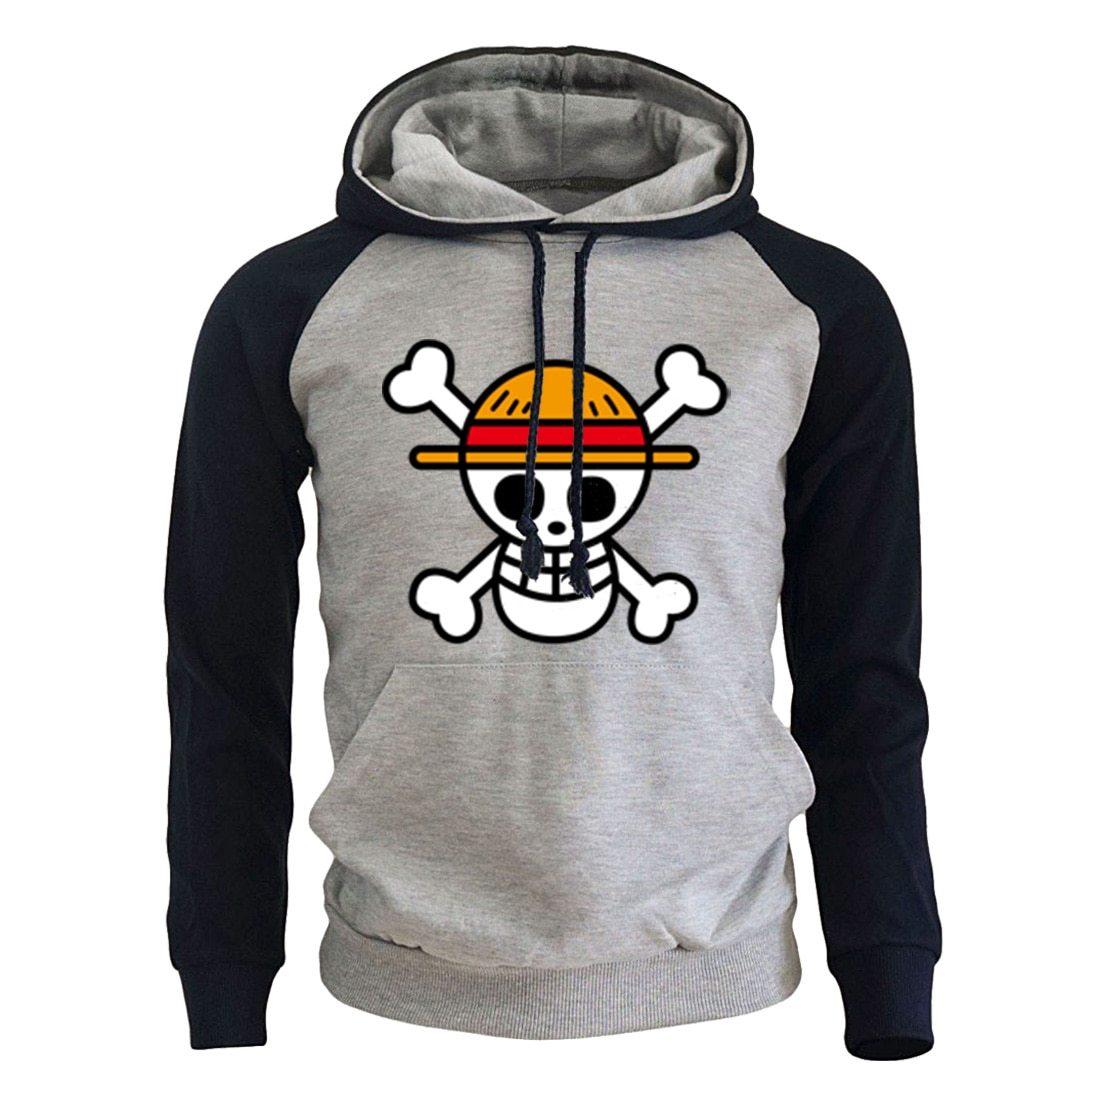 One Piece Logo Hoodie MNK1108 dark blue-gray / S Official One Piece Merch